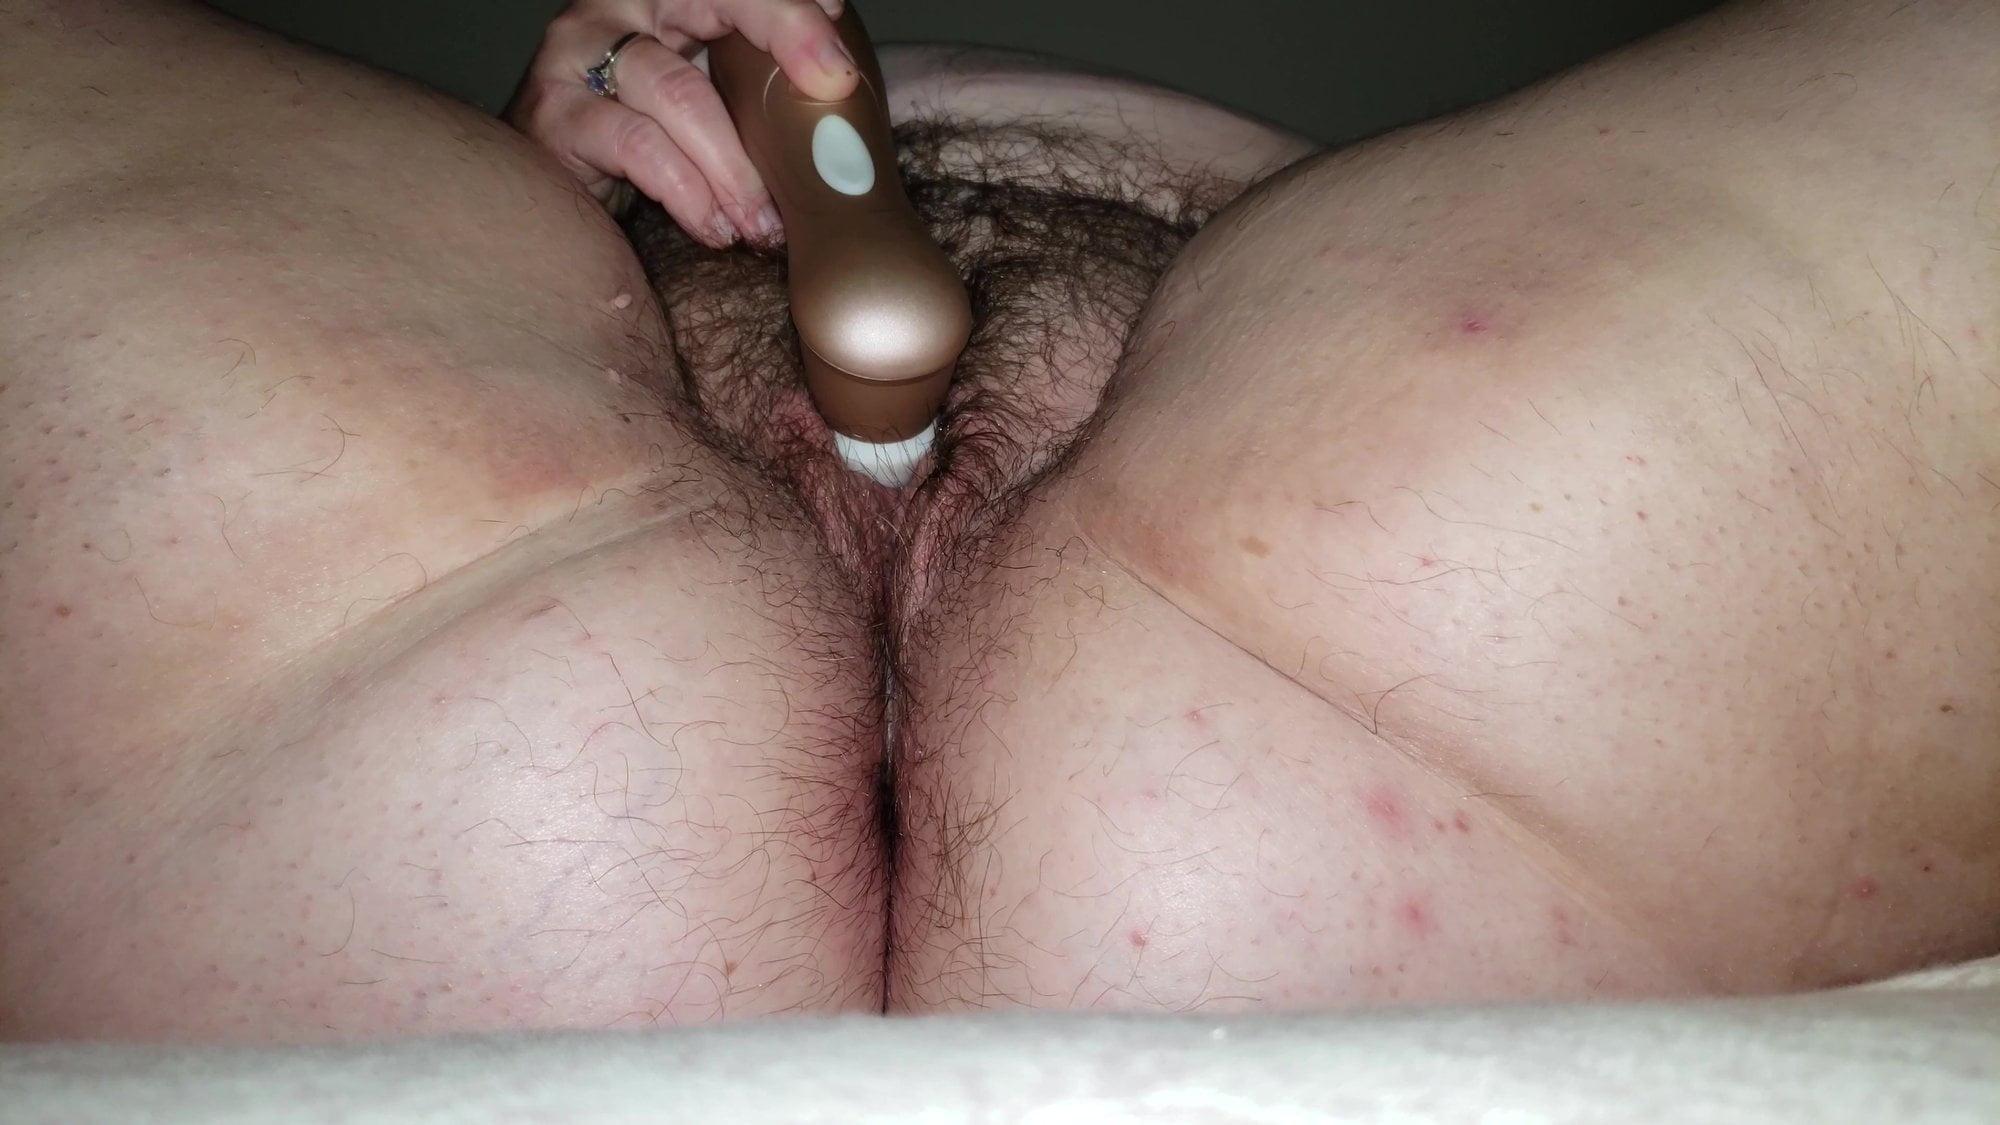 Chubby Hairy Mature Anal